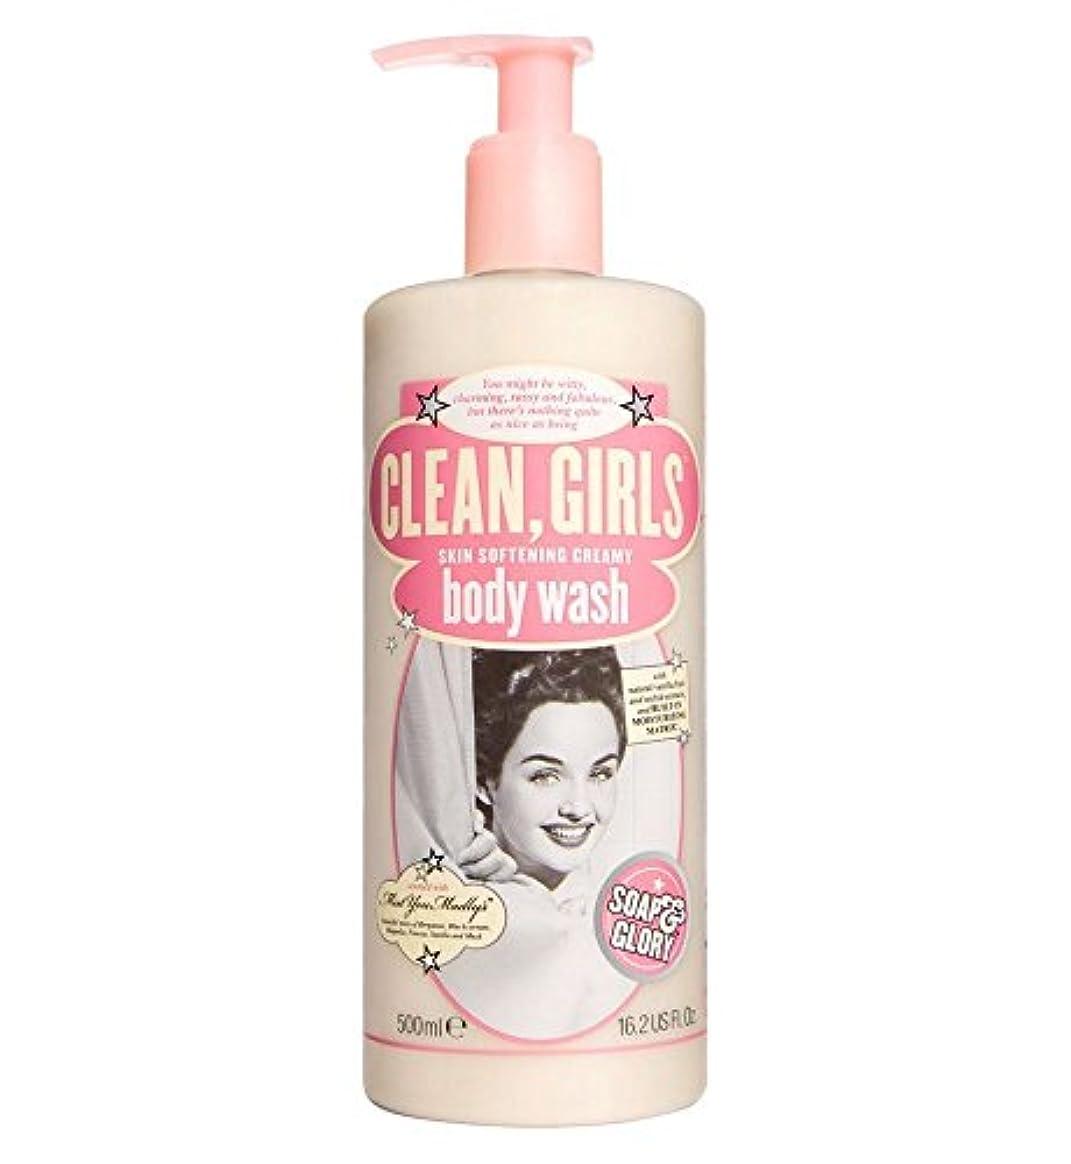 Soap & Glory Clean Girls Body Wash 500ml by Soap & Glory [並行輸入品]